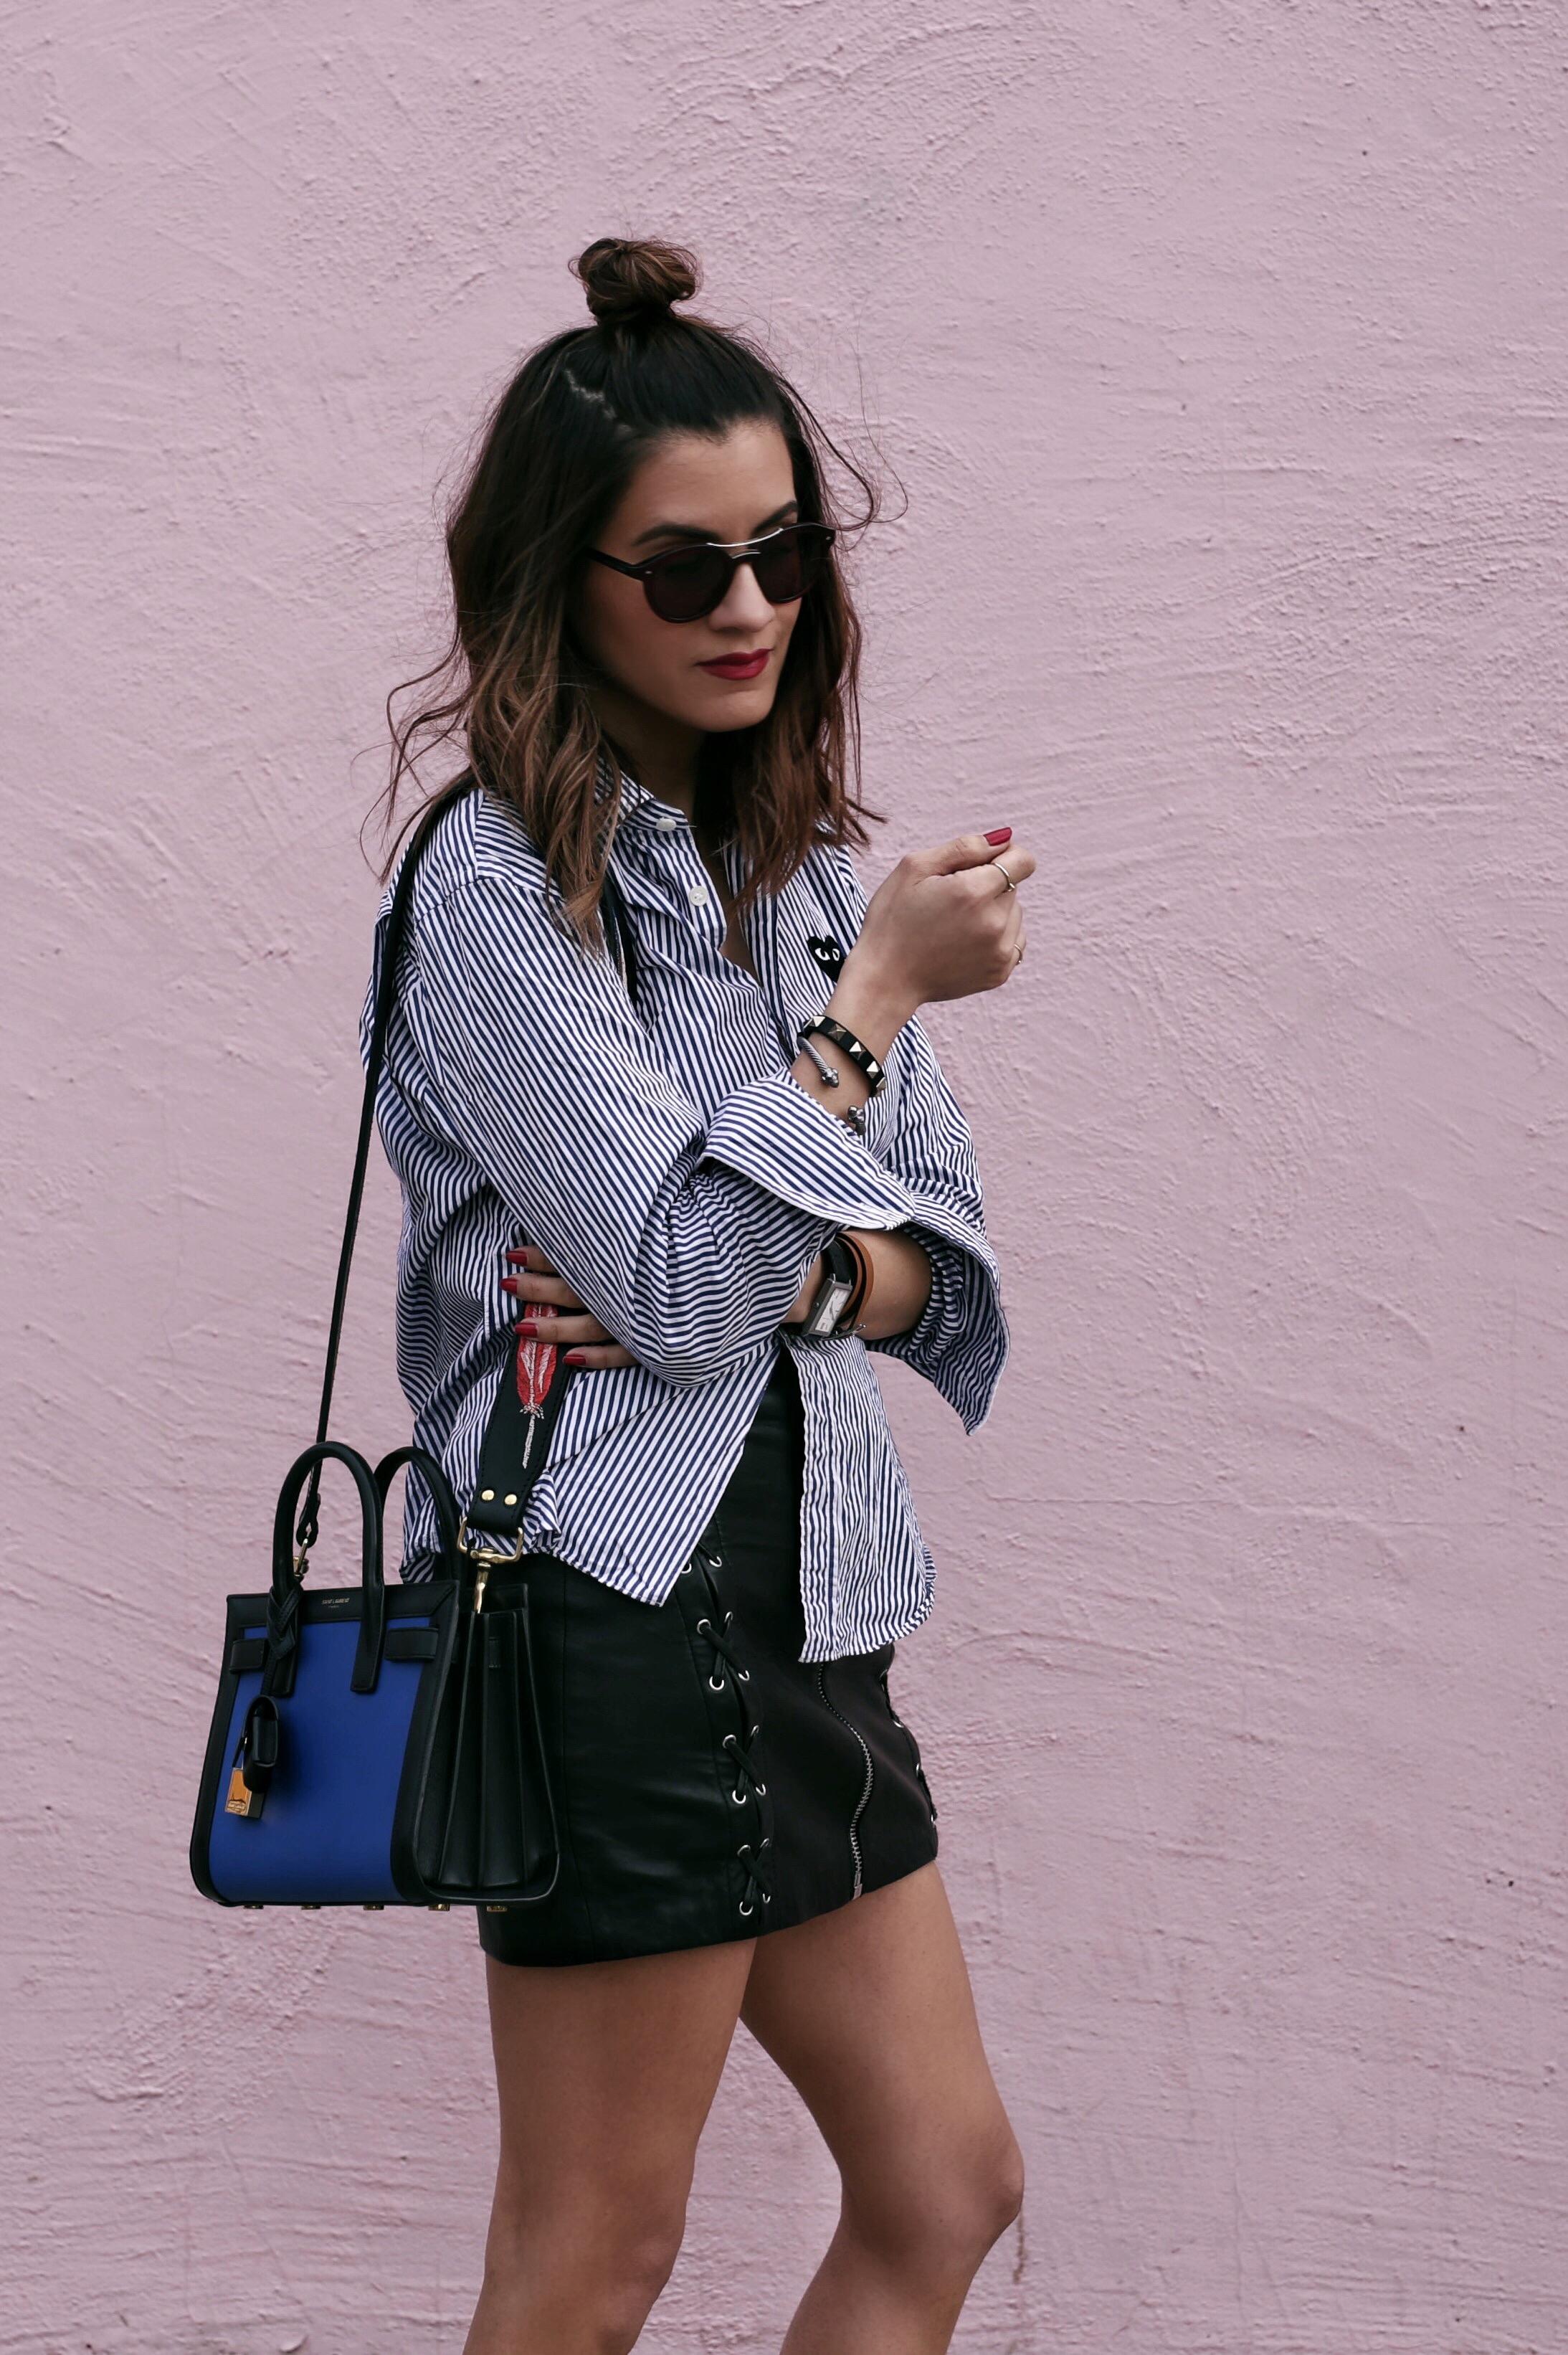 comme des garcons striped shirt - blue saint laurent nano sac de jour bag - kate cate handbag strap - the kooples leather zip skirt - summer style - top bun hair style - woahstyle_8071.JPG